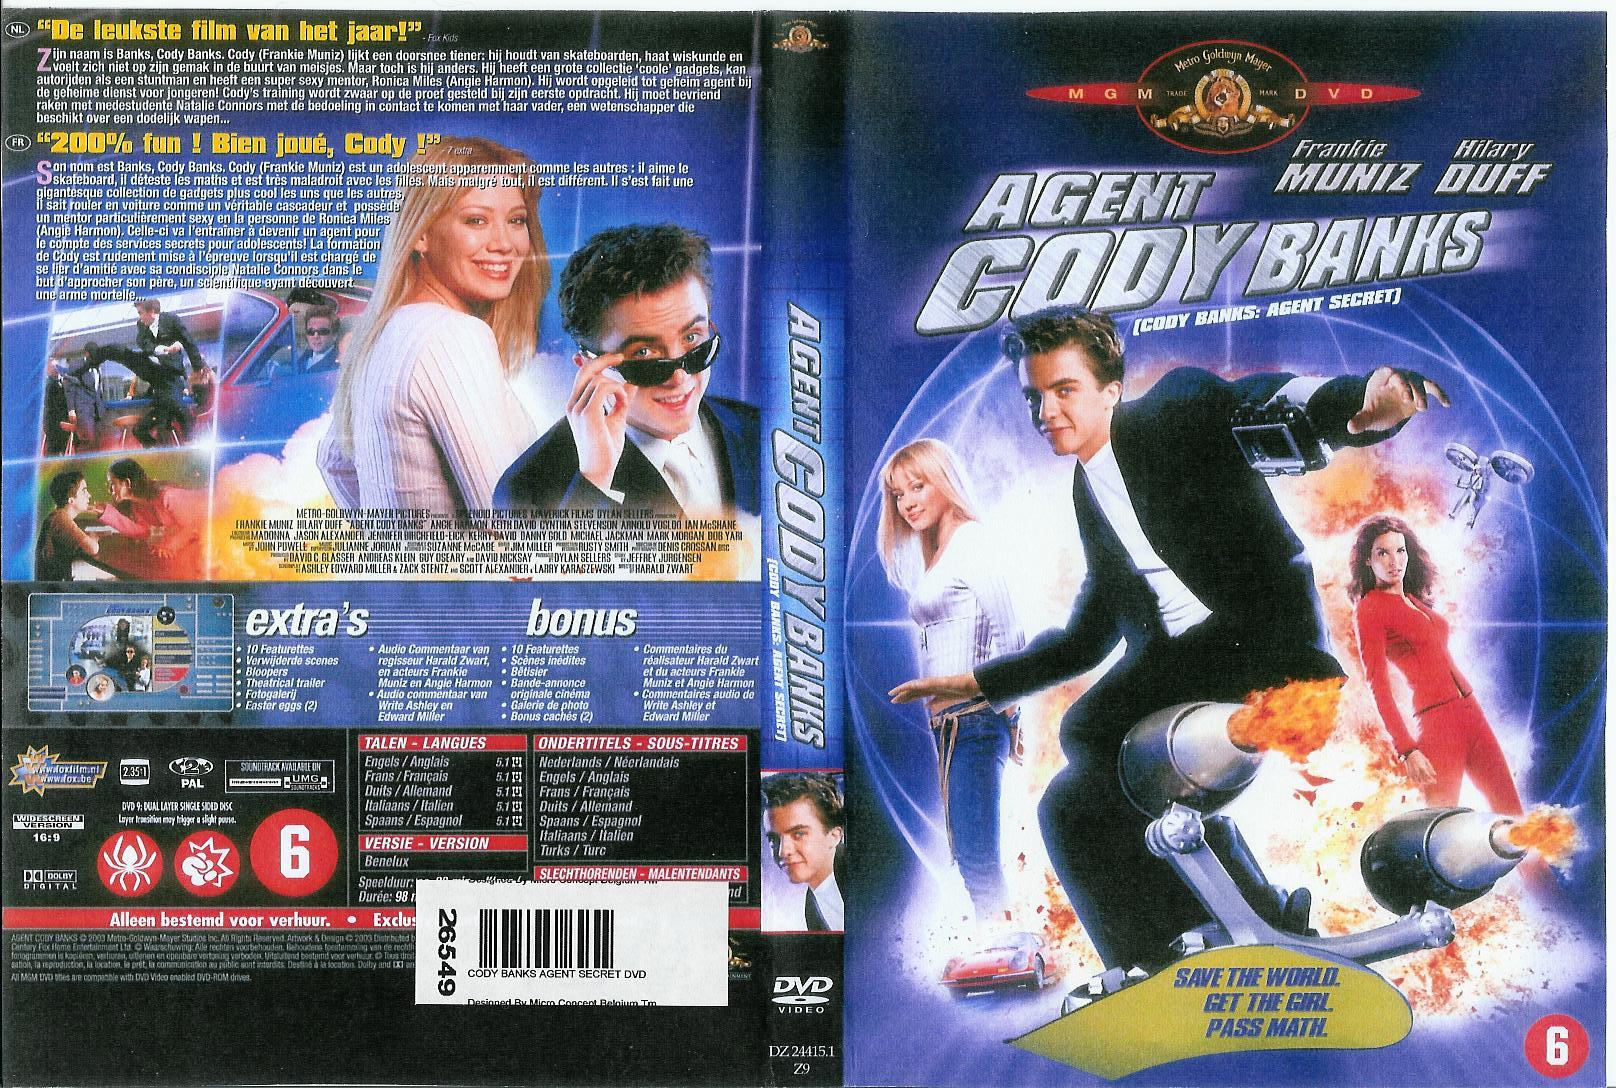 http://www.megghy.com/immagini/cover_dvd/a/agent%20cody%20banks.jpg.jpg